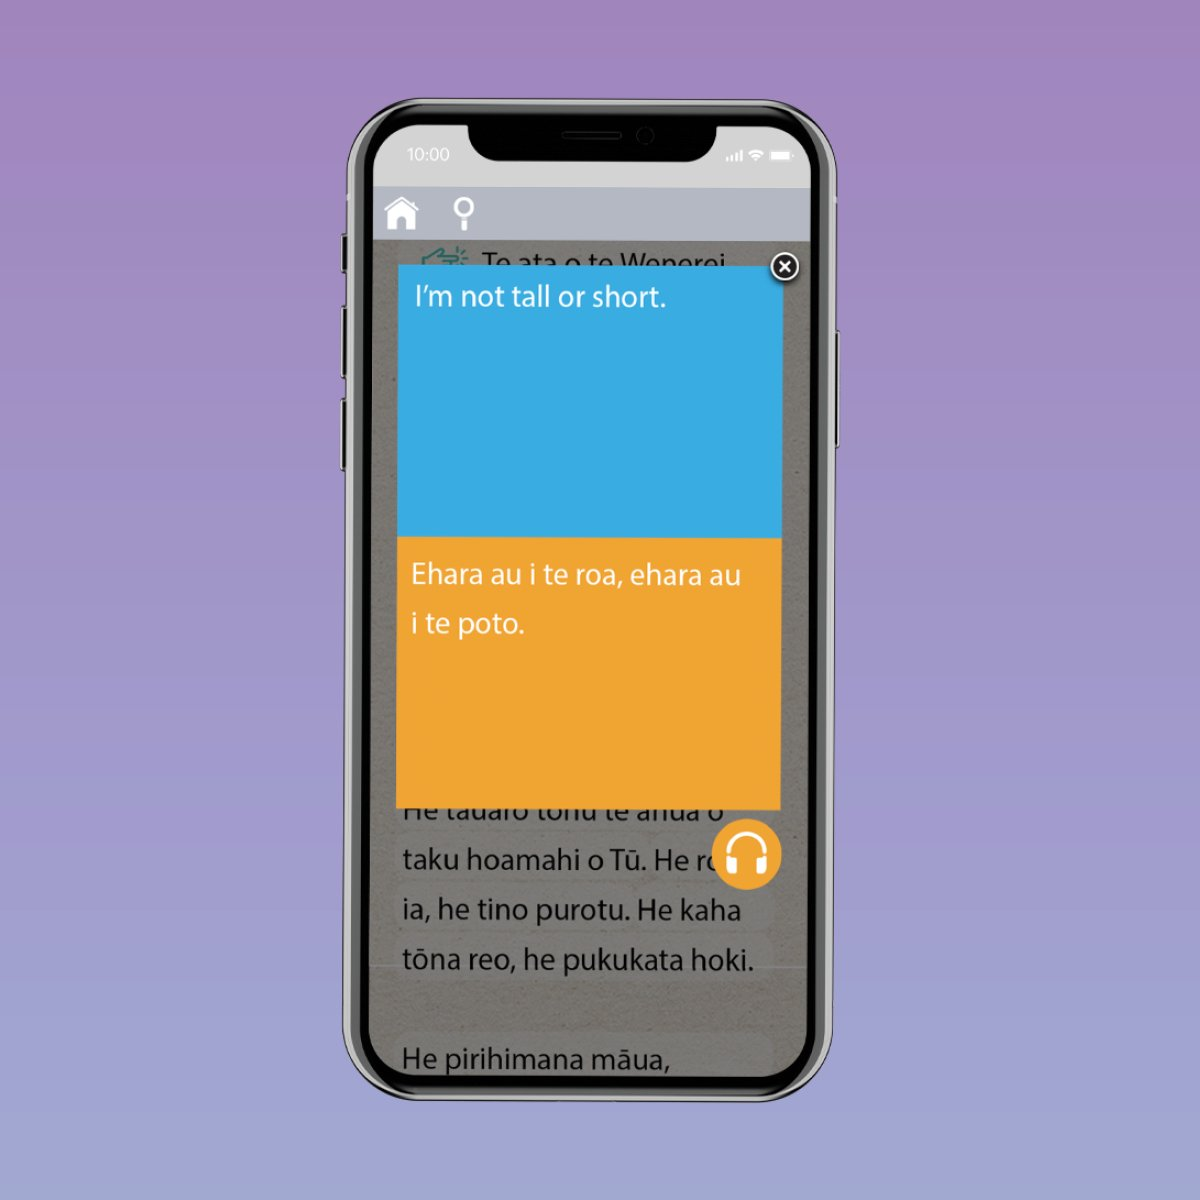 Lingogo-Libraries-DigitalAssets-1200x12003